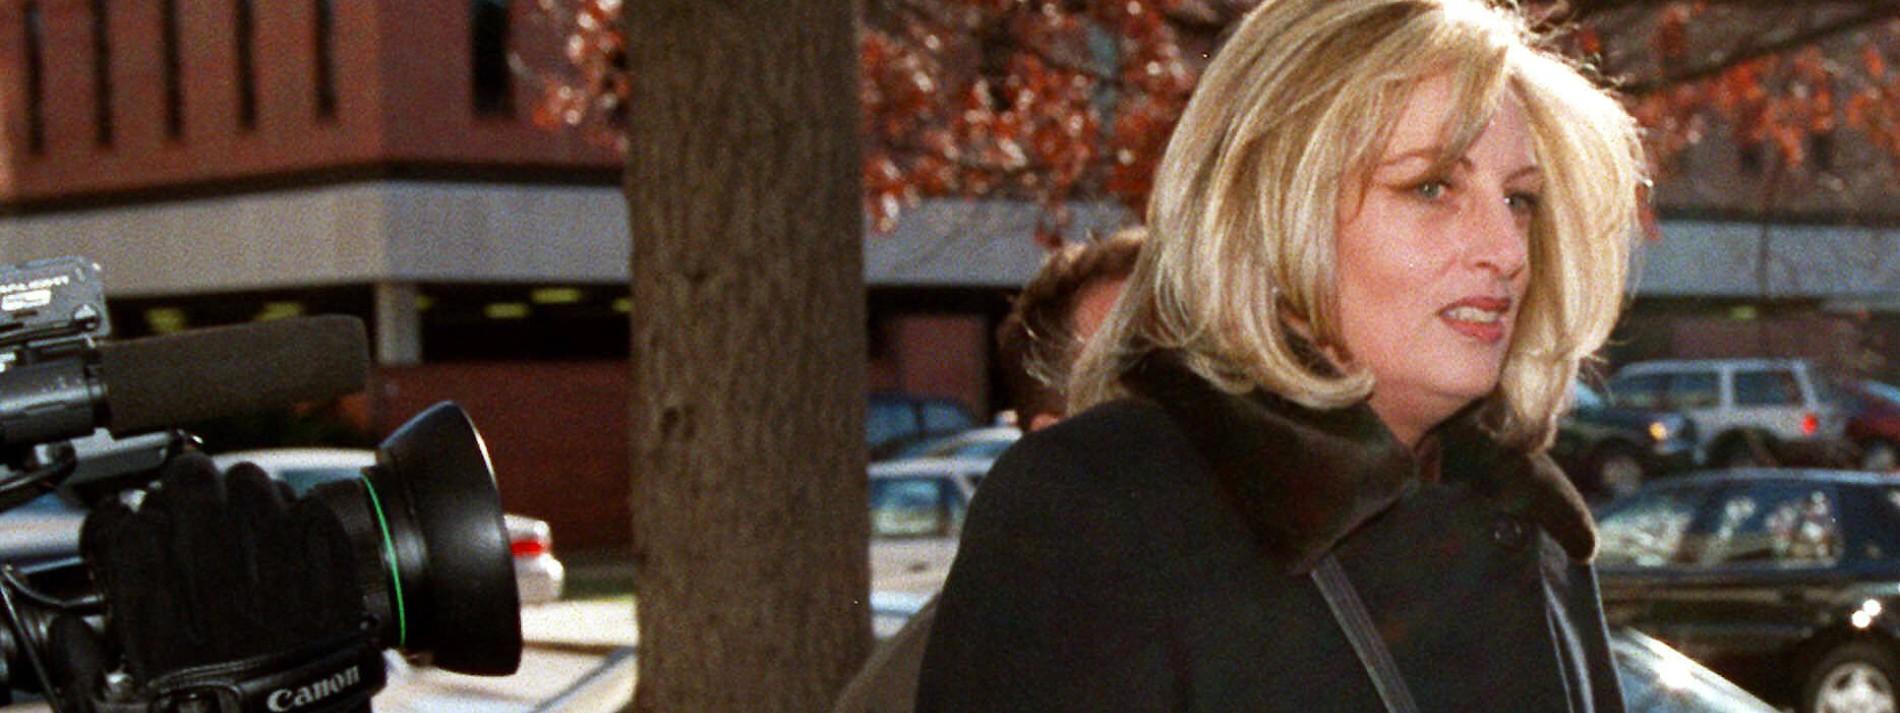 Auslöserin der Lewinsky-Affäre gestorben